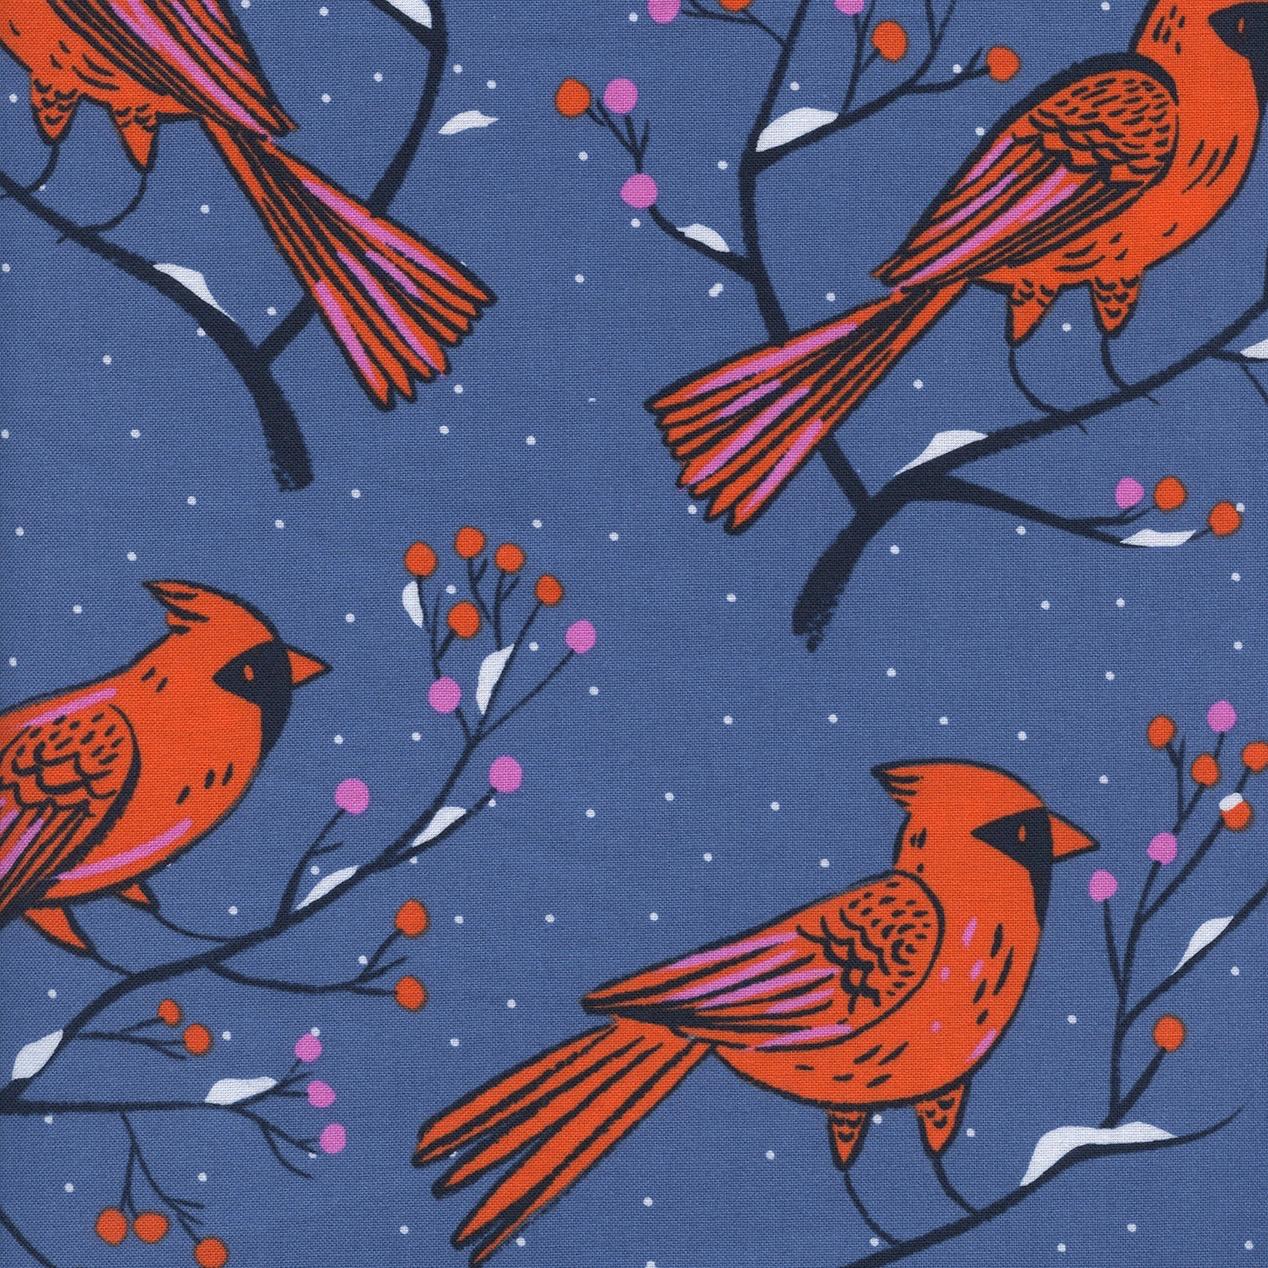 Cotton + Steel Frost - Winter Cardinals (Blue)